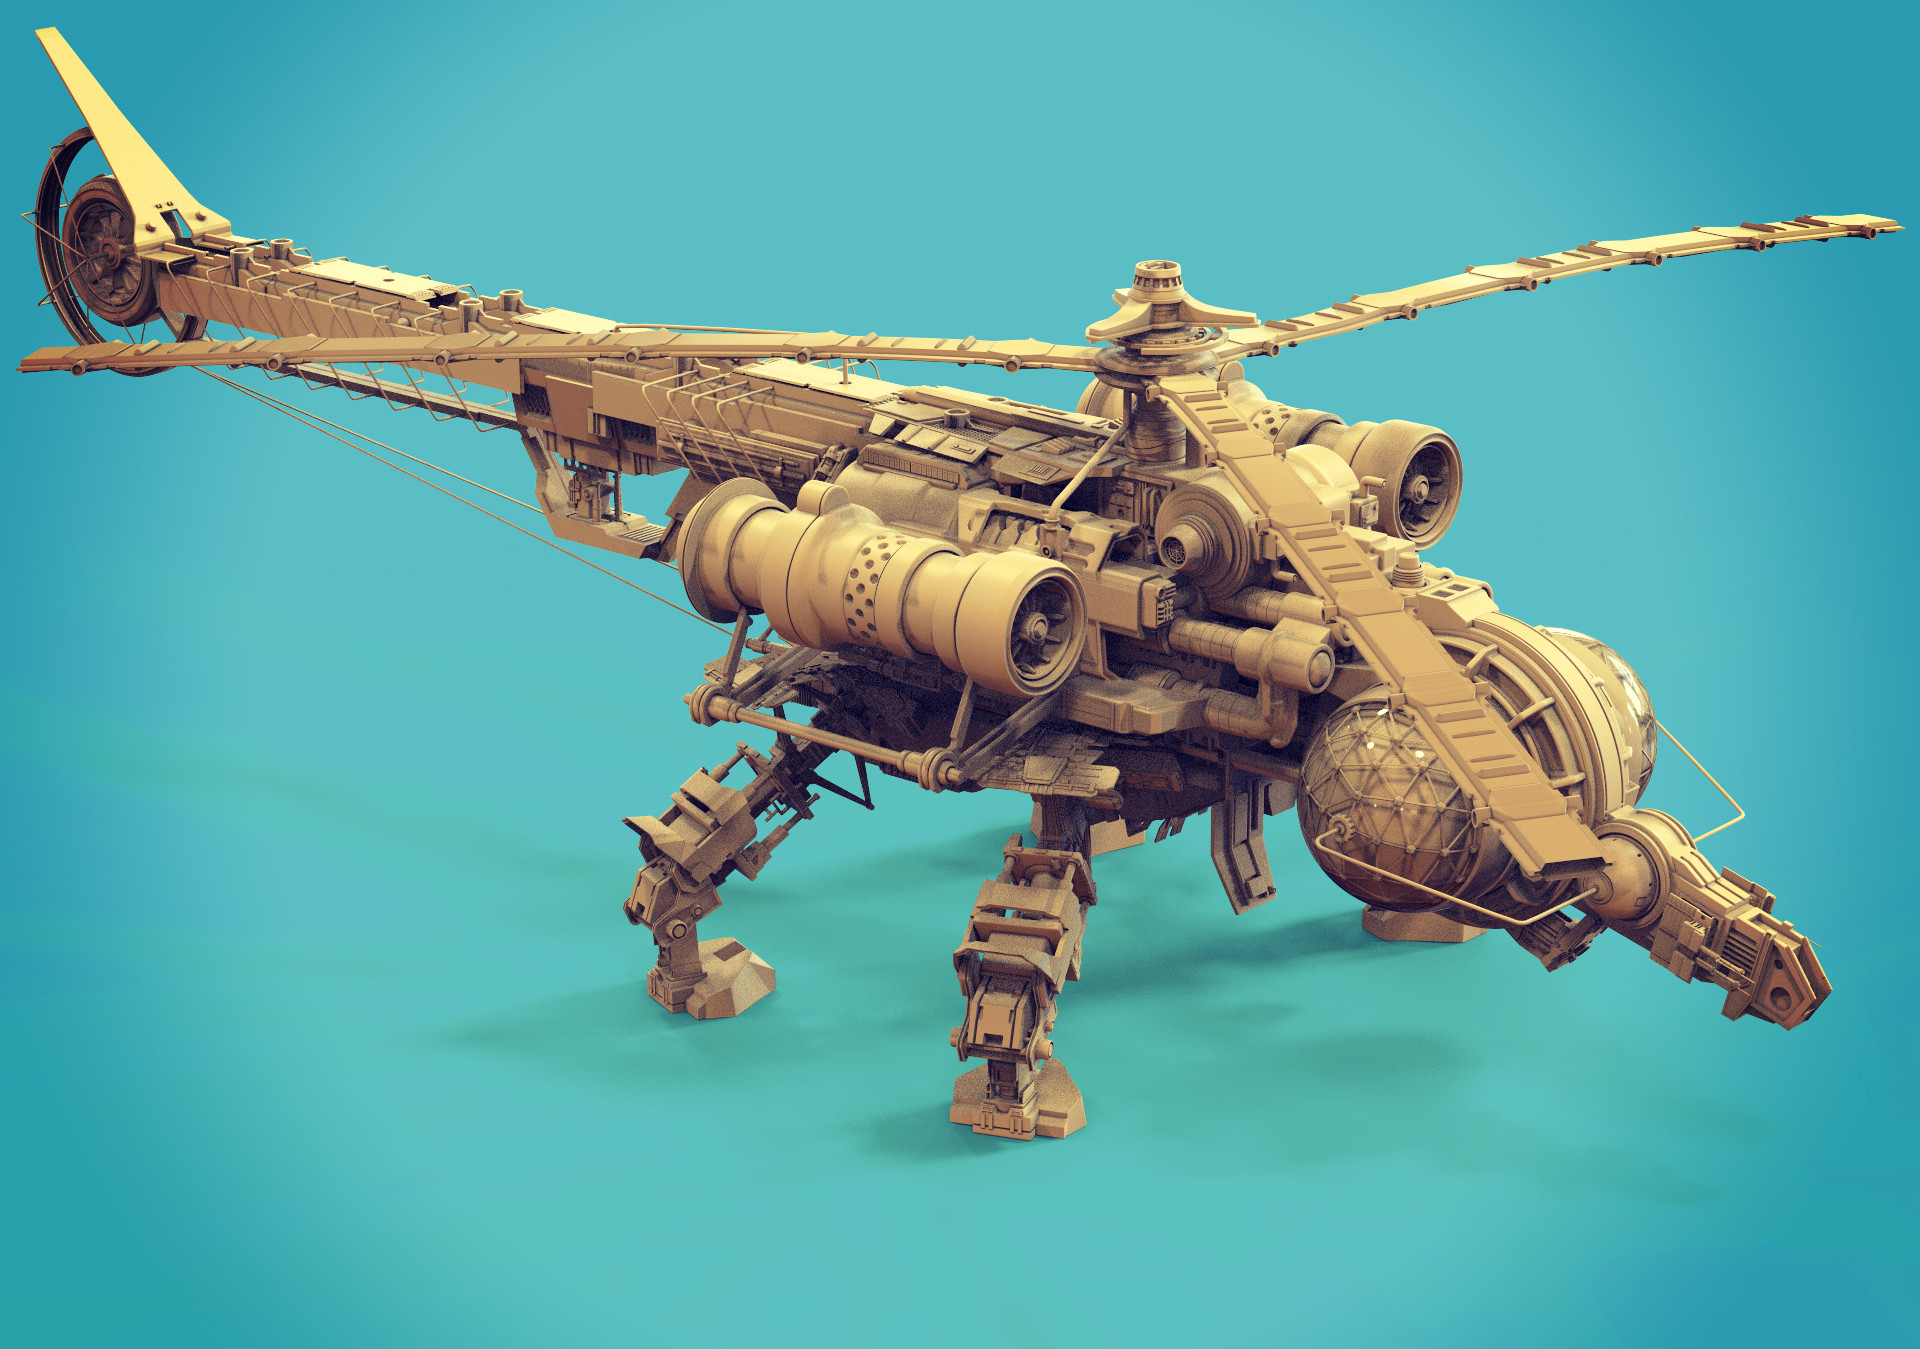 Ben nicholas bughelicopter 01